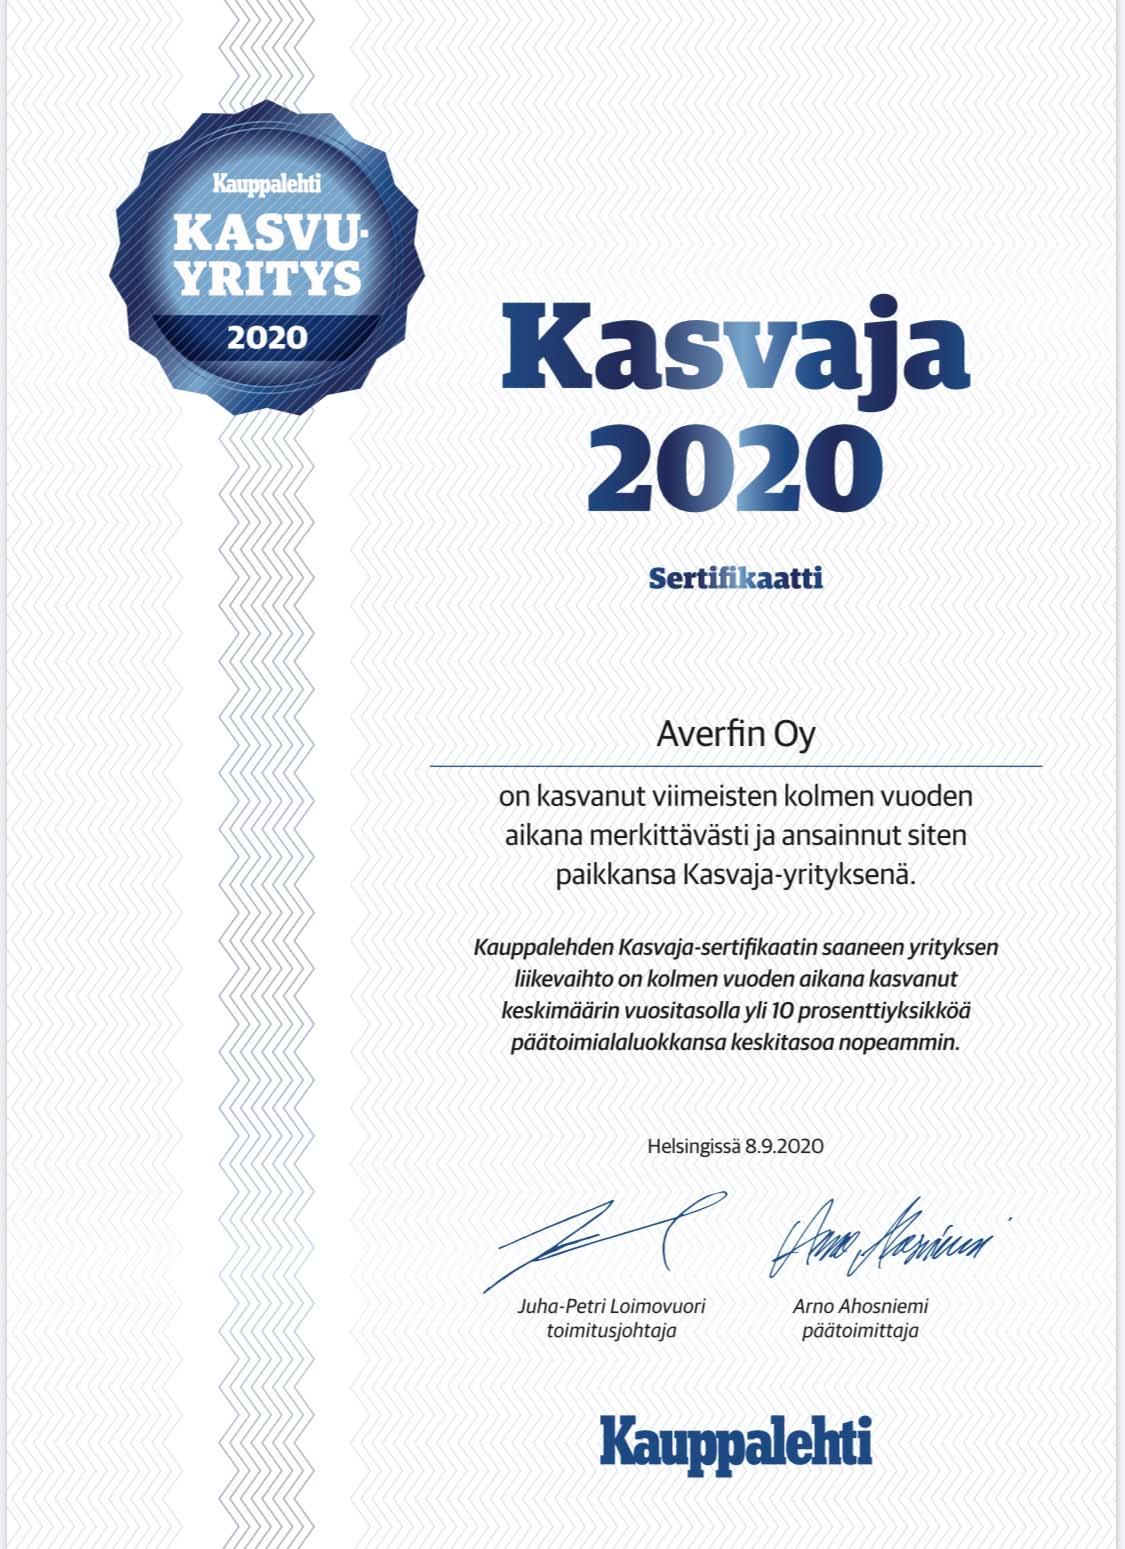 Kasvuyritys 2020 - Averfin Oy